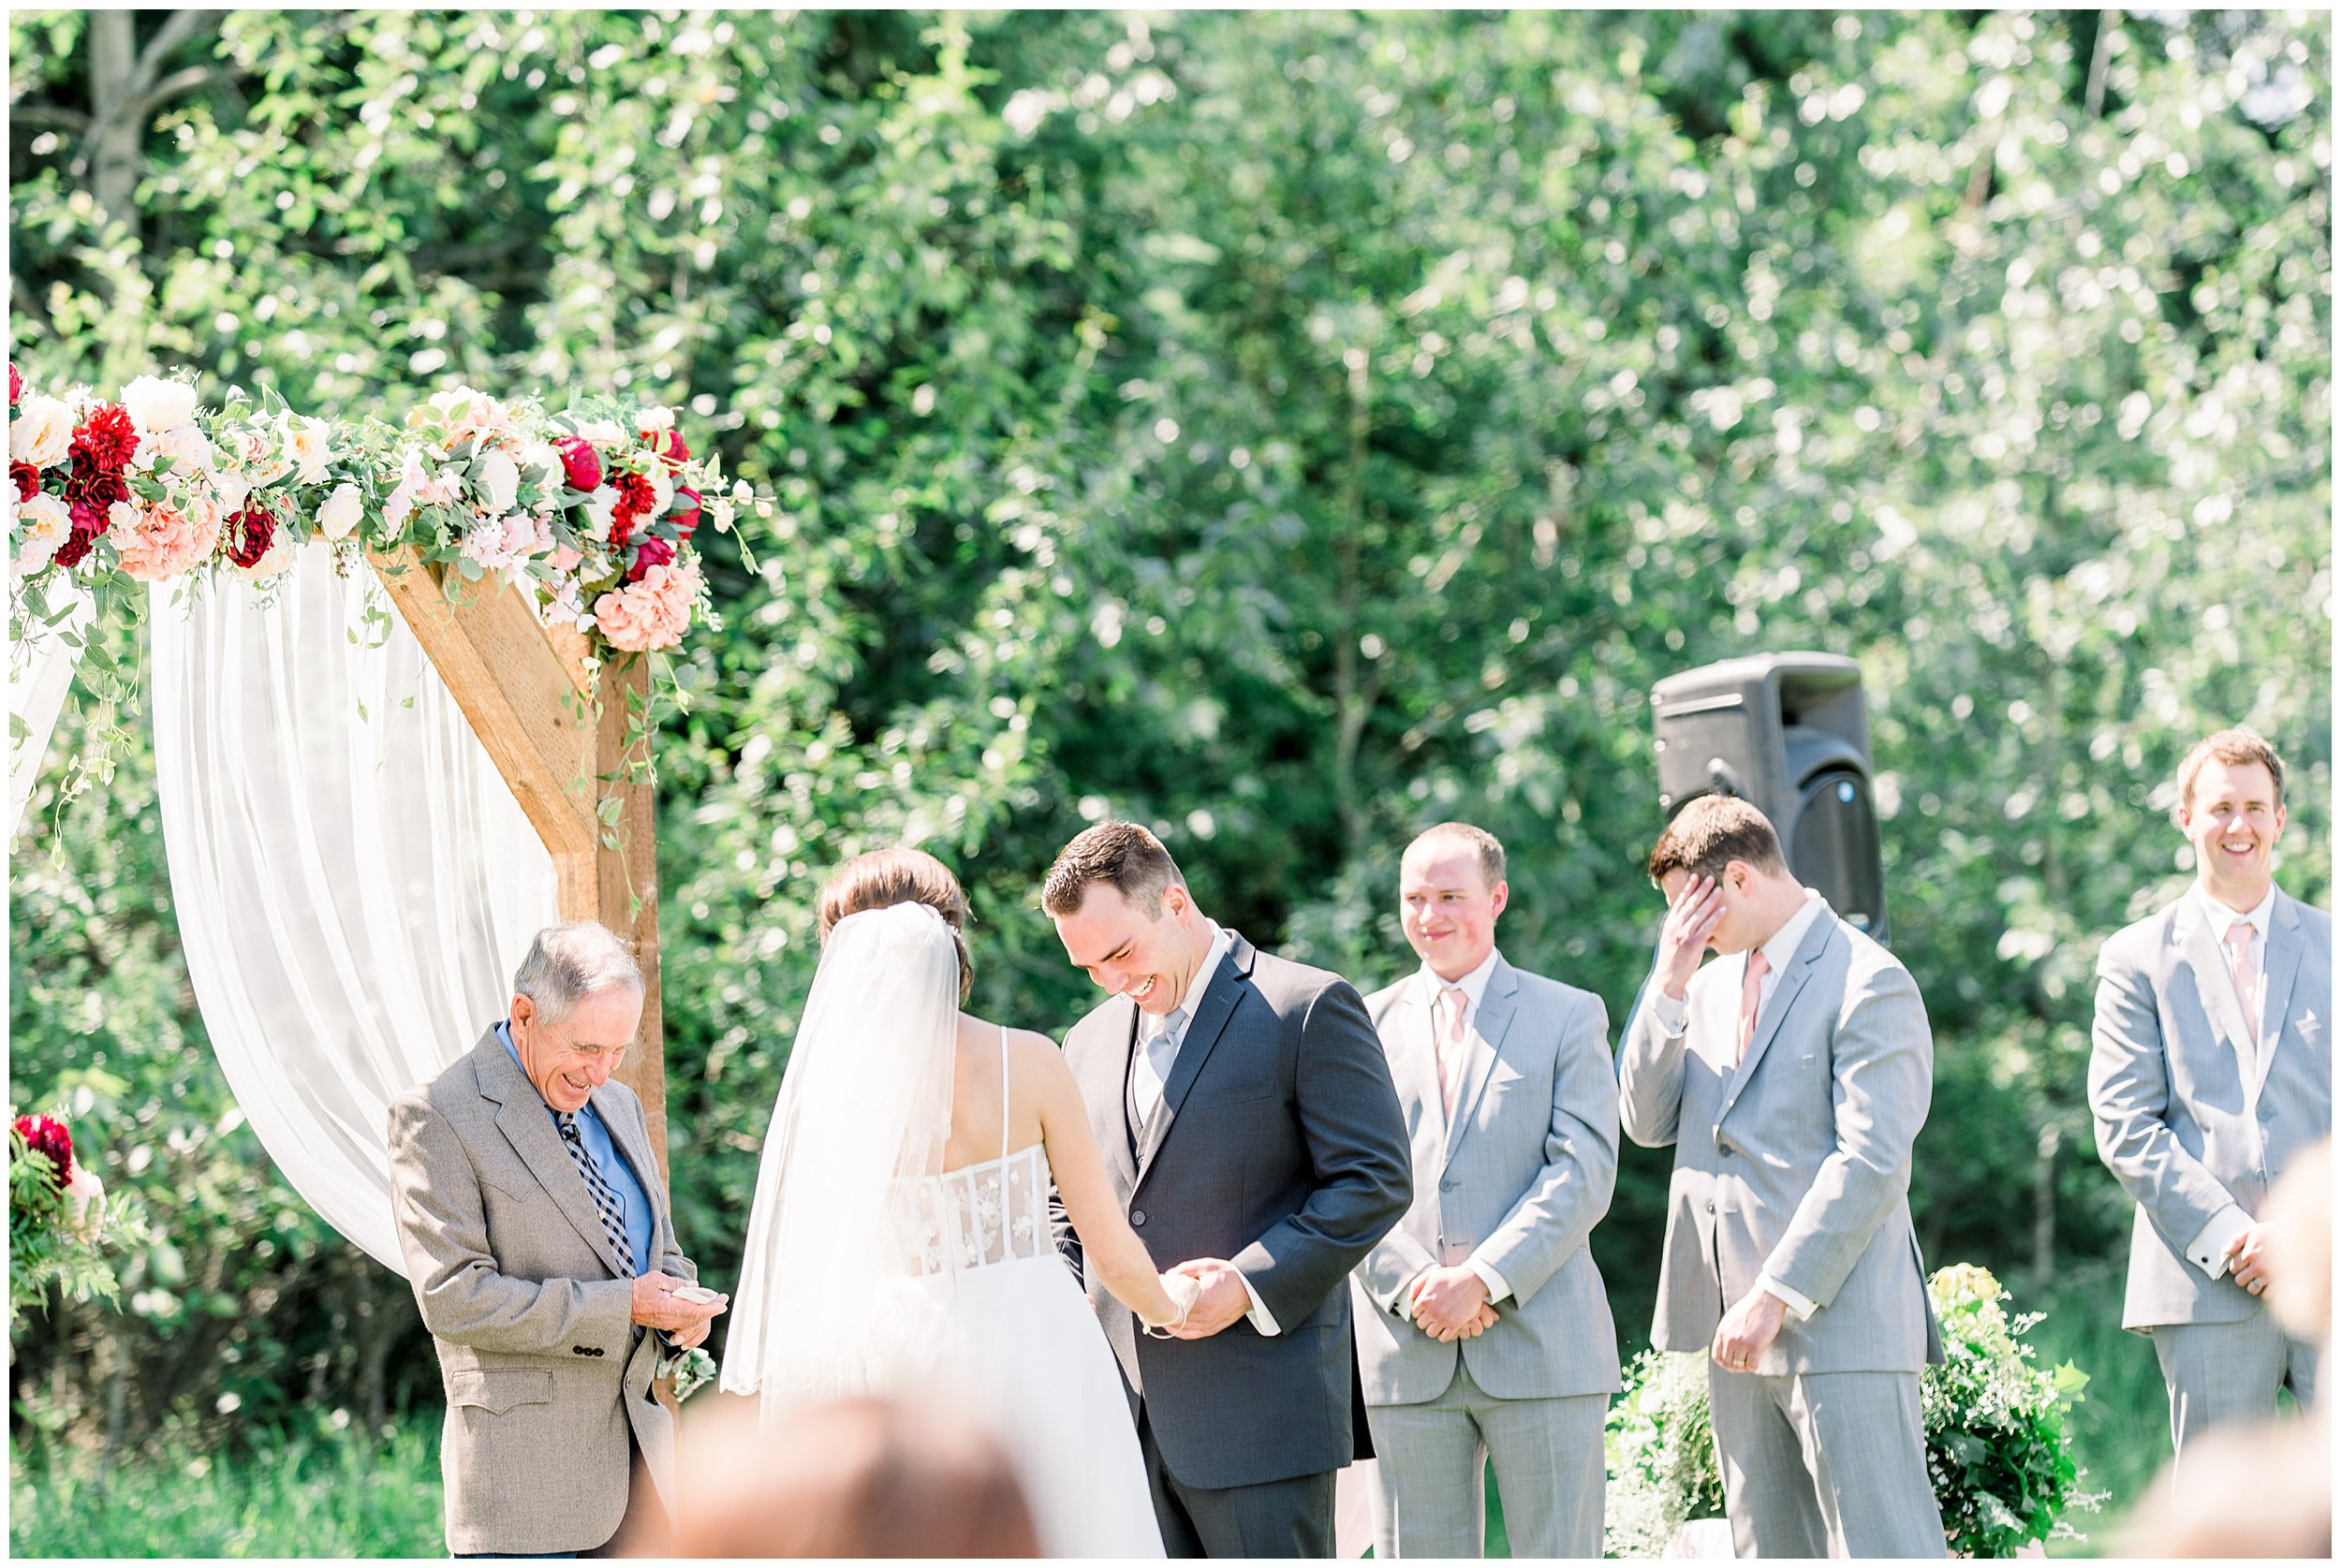 Alyssa-Poland-Photography_0615_alberta wedding.jpg